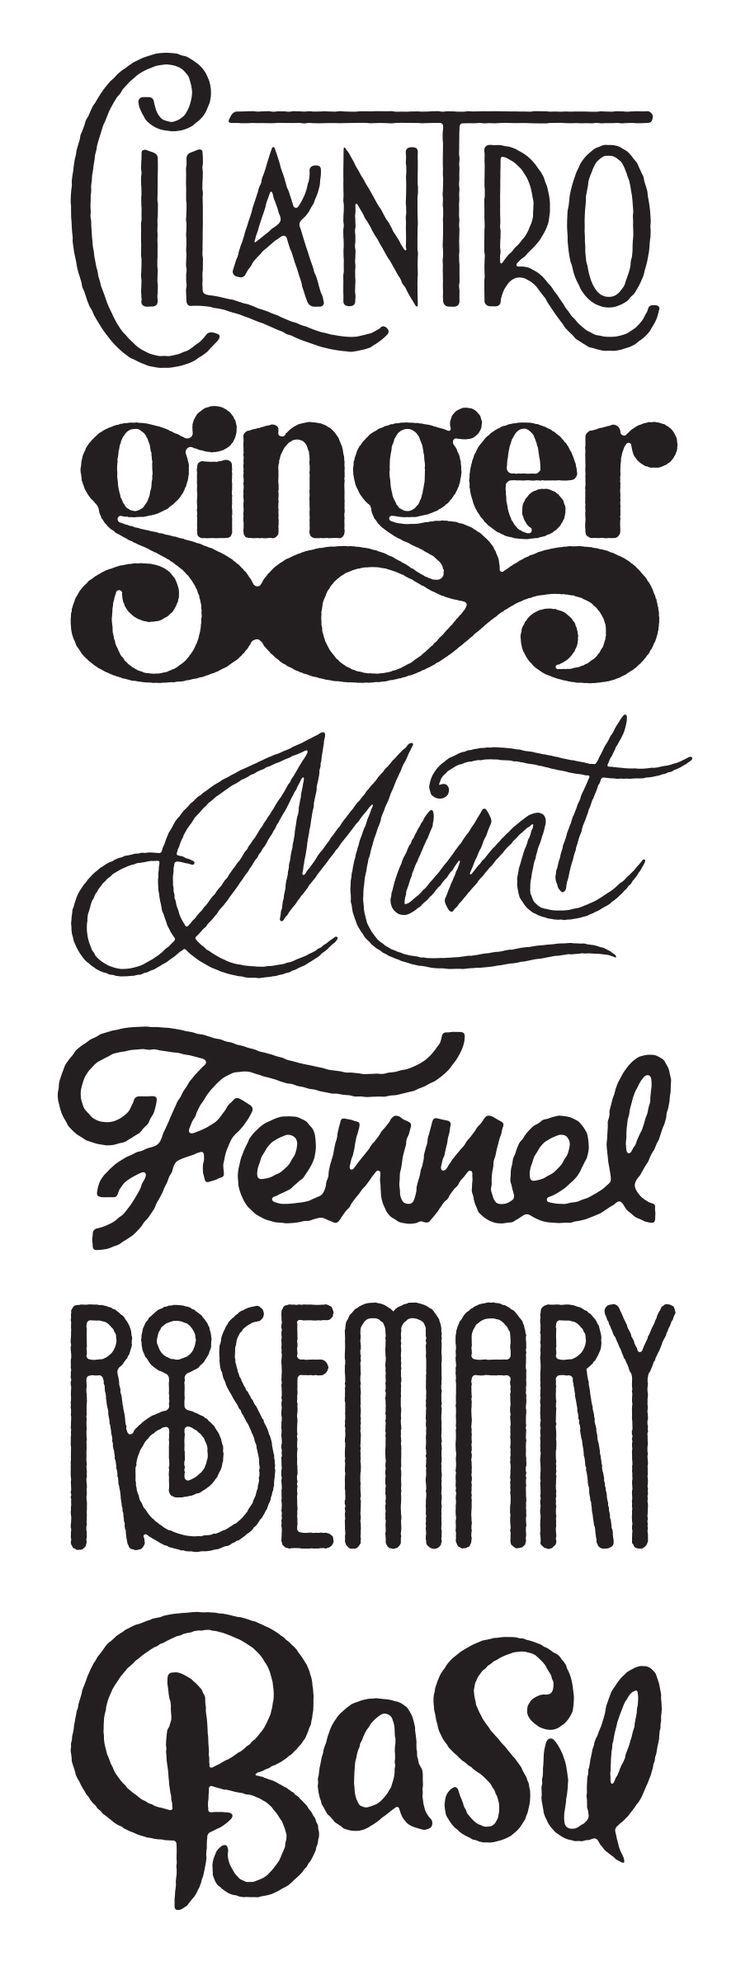 fuentes geniales. #Typography #font